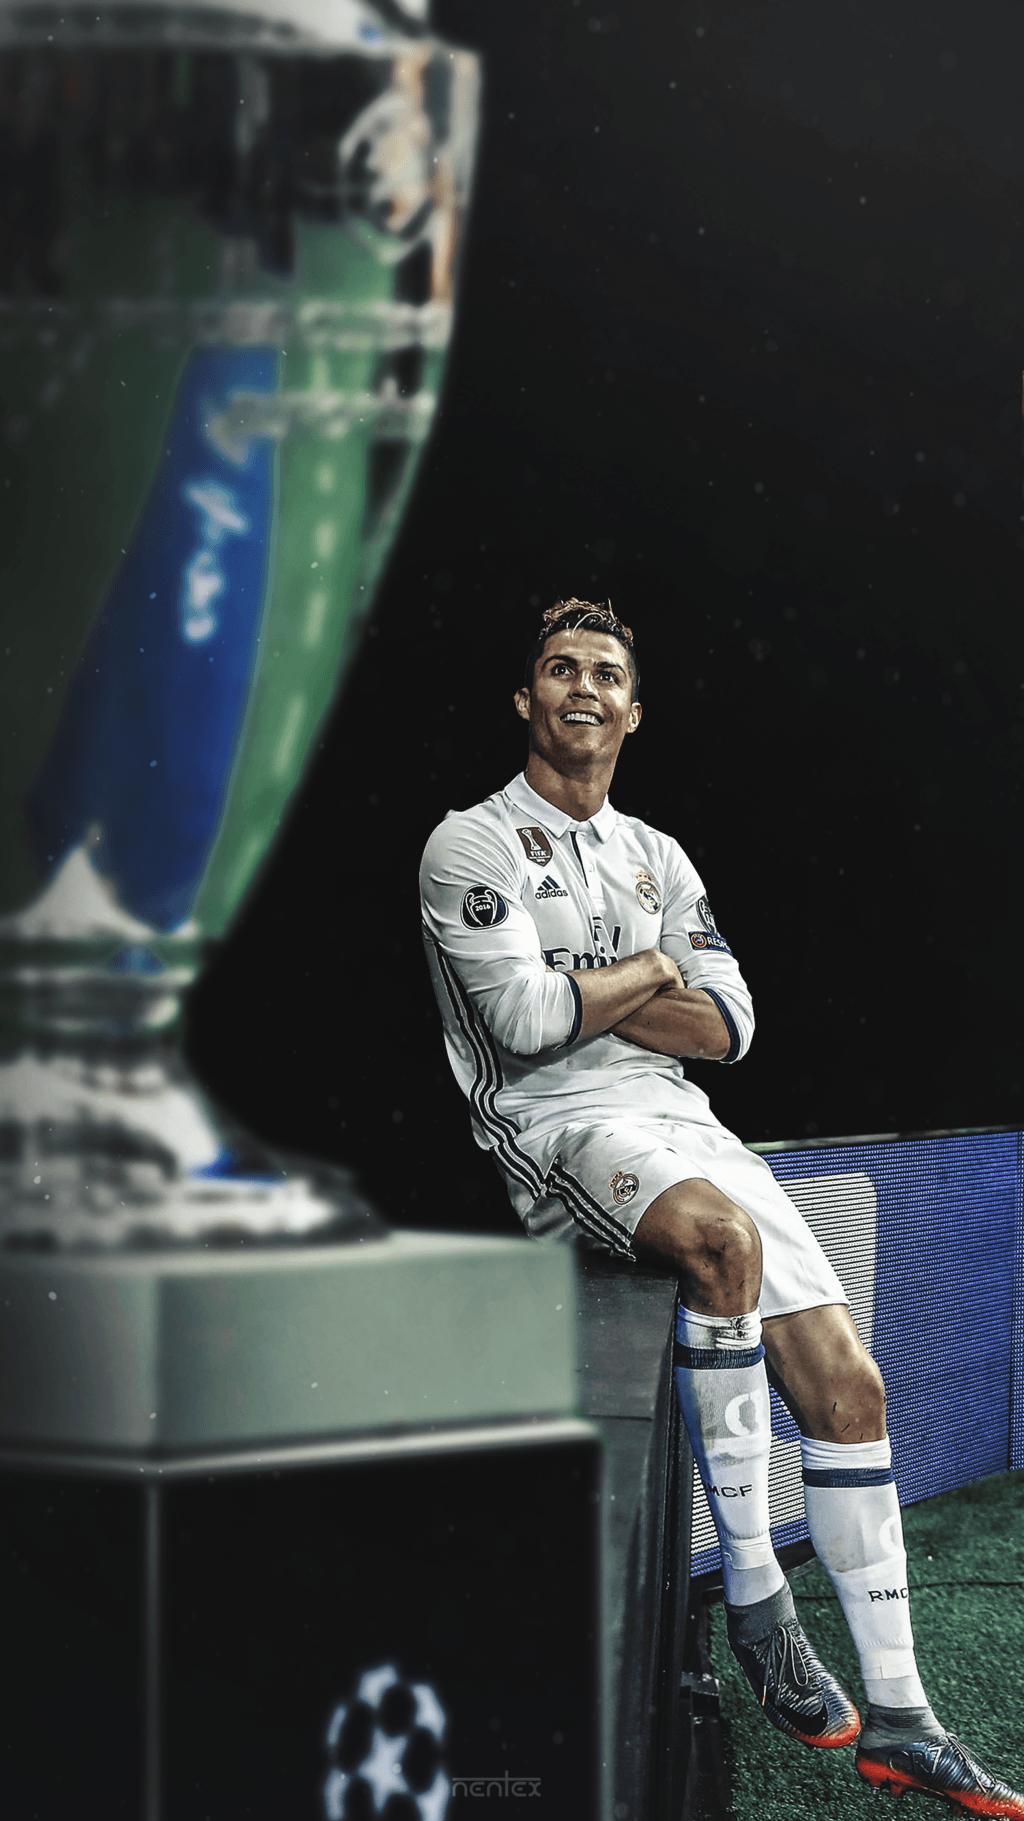 Cristiano Ronaldo Hd 2017 Wallpapers Wallpaper Cave